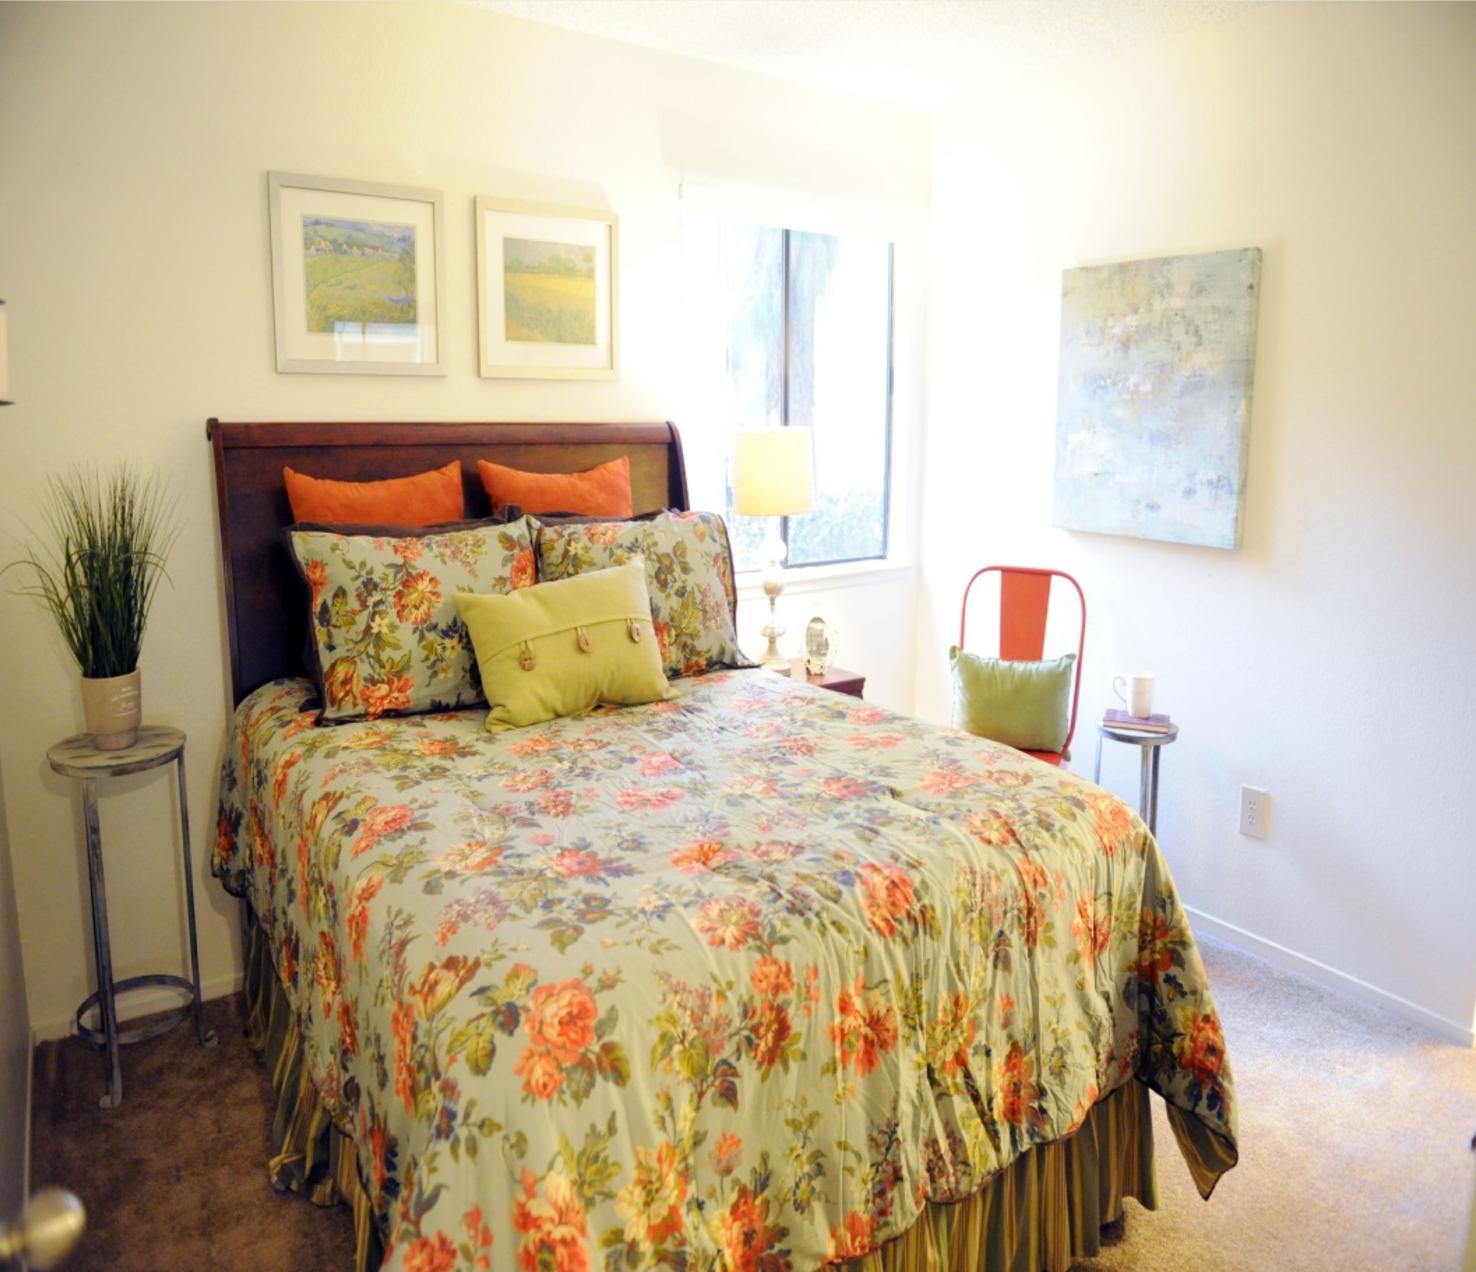 Villa Sienna Apartments Bakersfield, CA